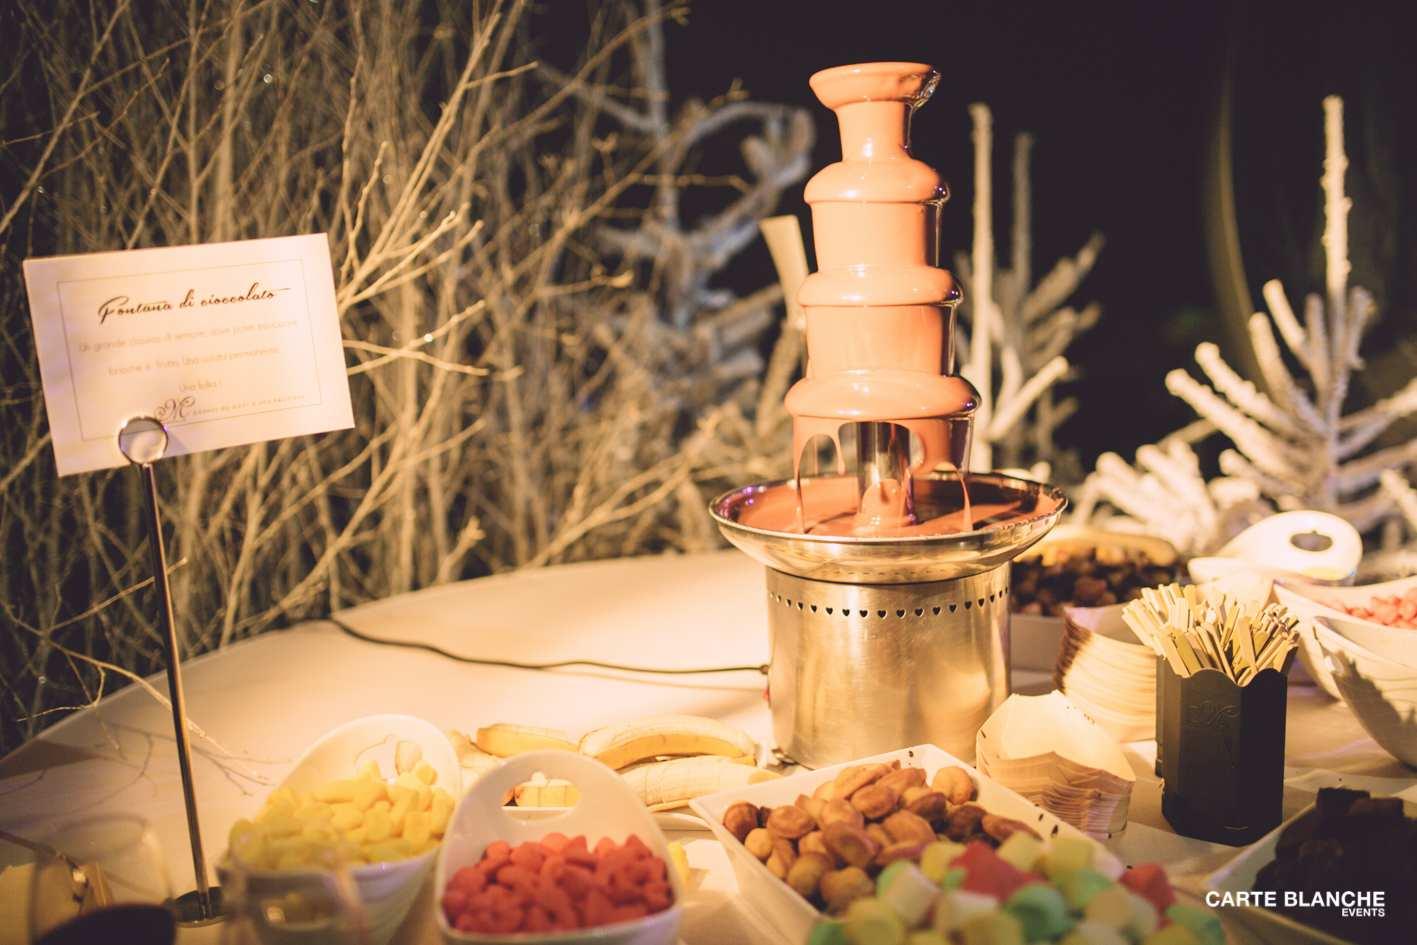 xmas-party-ferrero-2013-fontaine-chocolat-carte-blanche